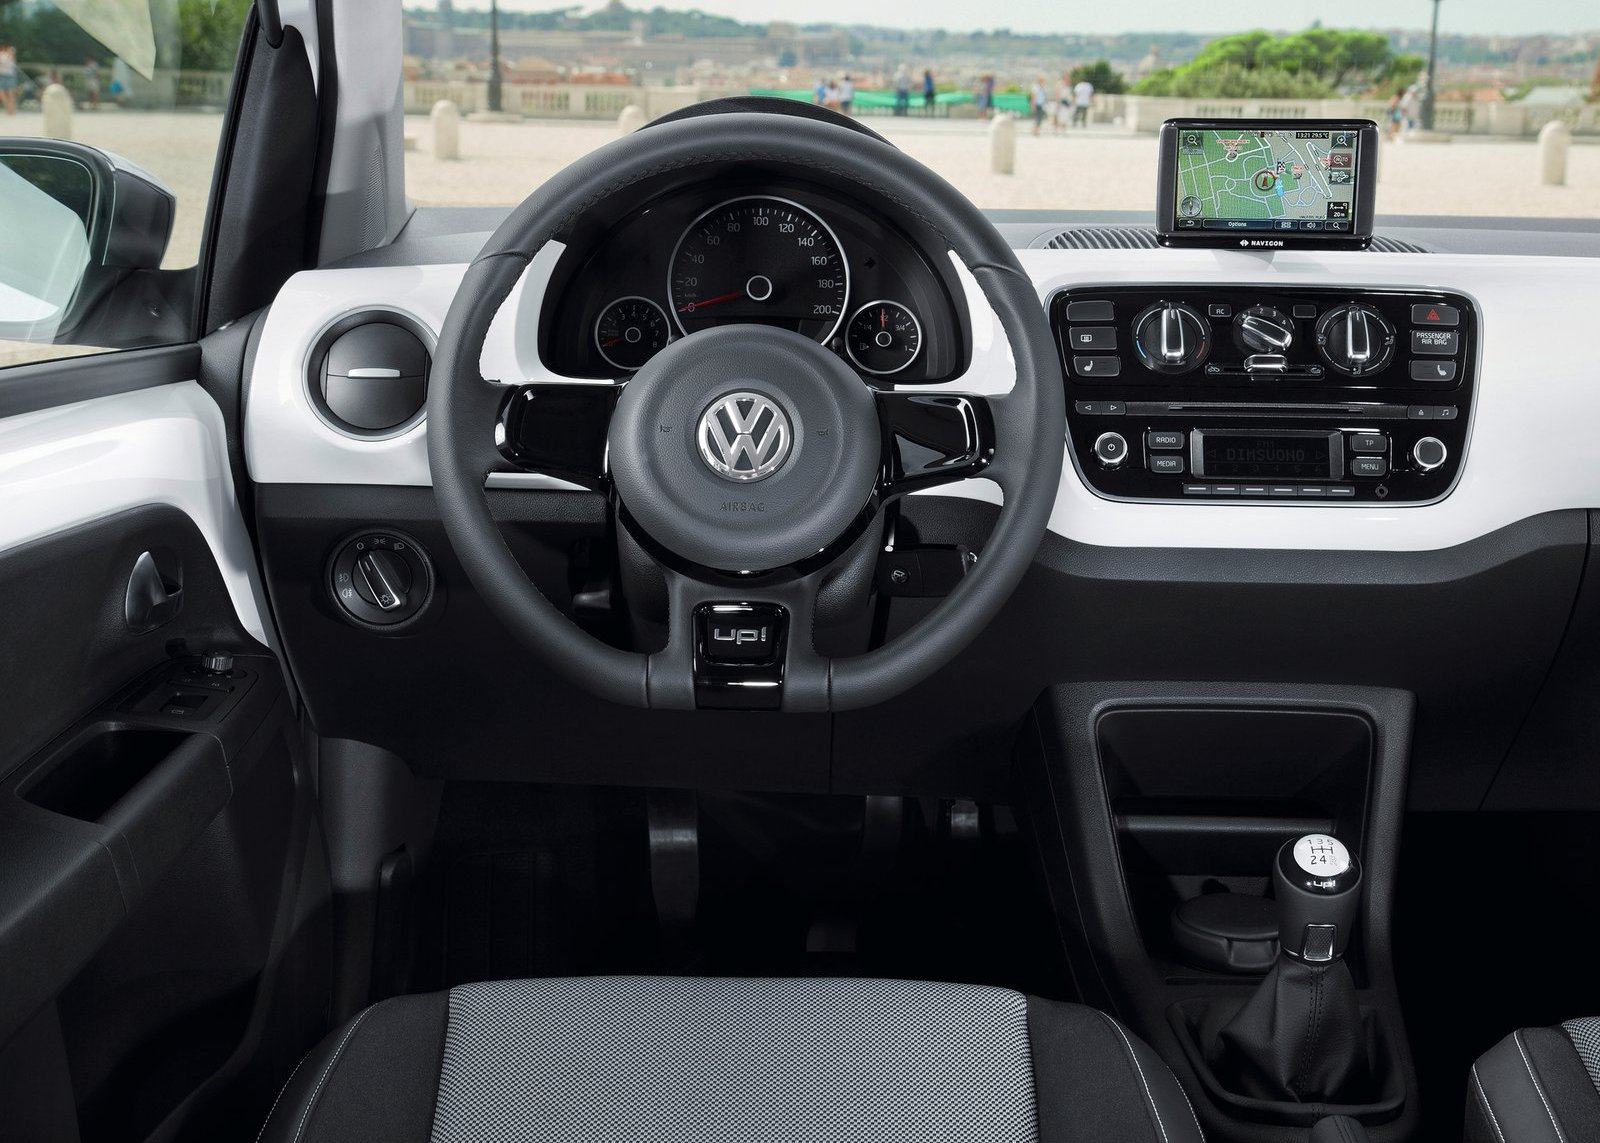 Stunning Volkswagen Interieur Ideas - Trend Ideas 2018 ...